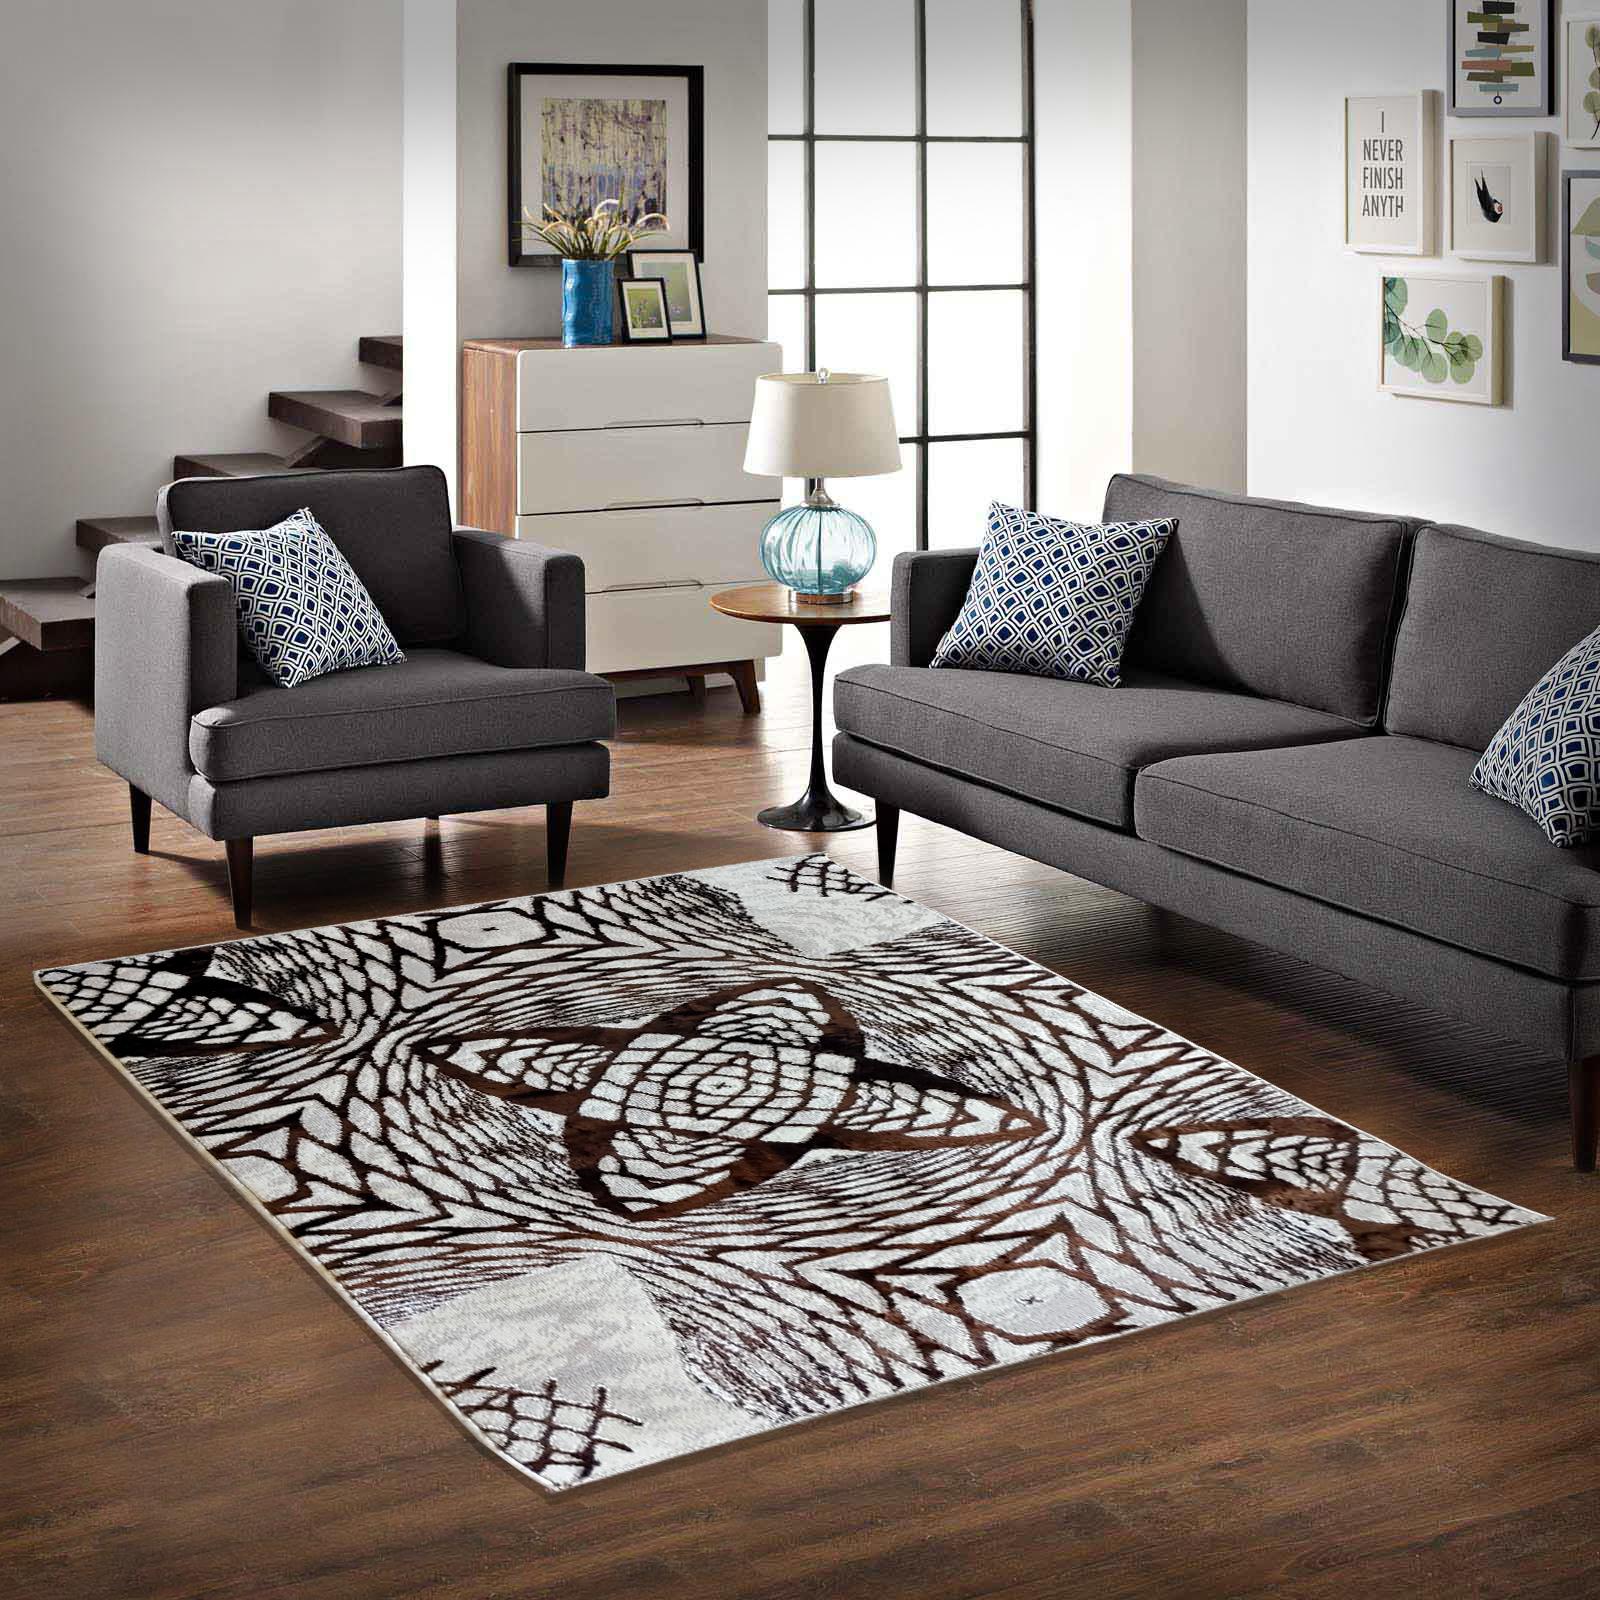 Konya Carpet Image